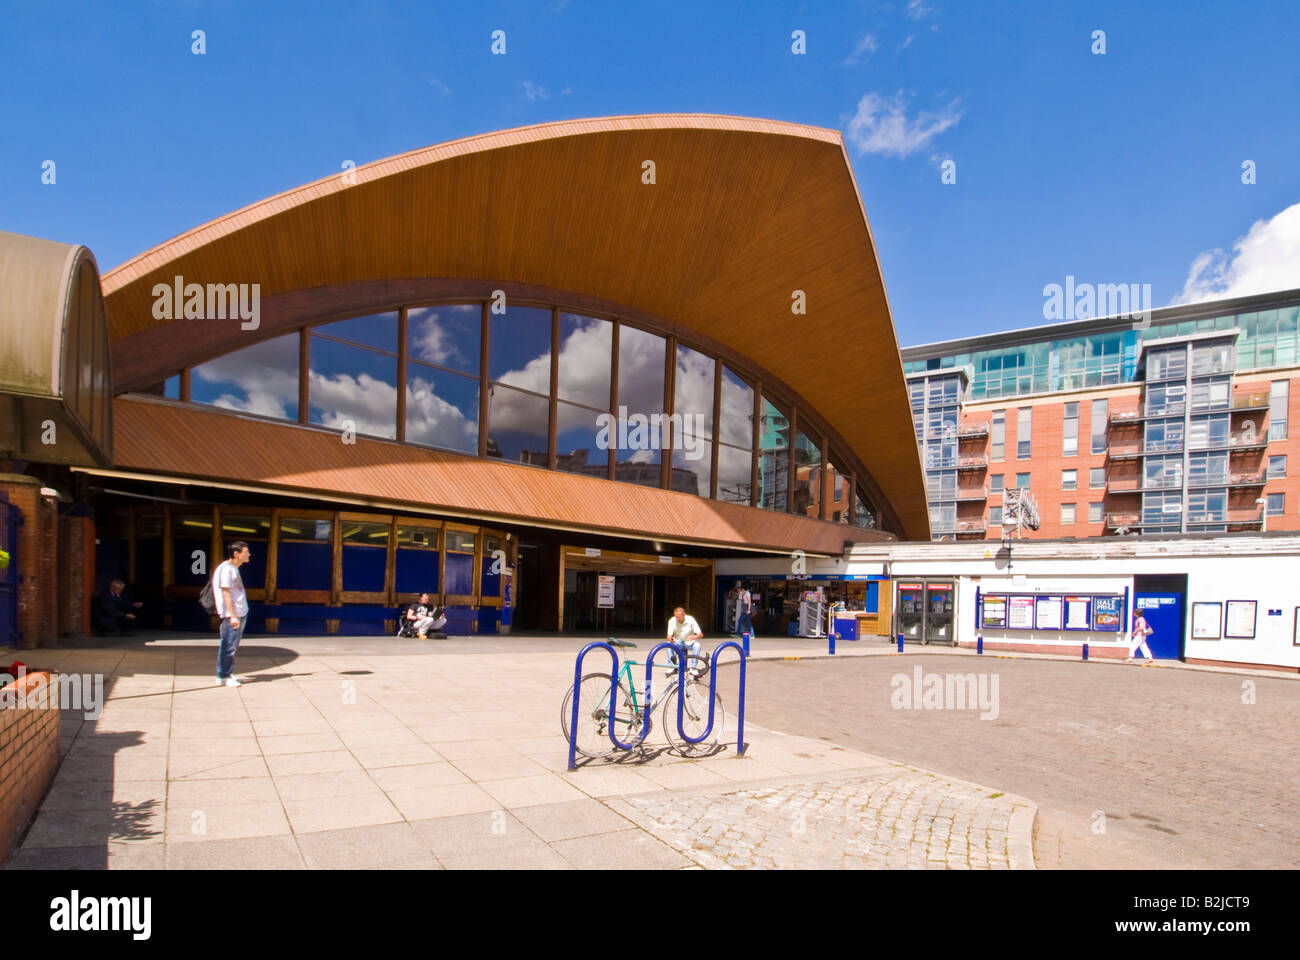 Manchester Oxford Road Railway Station entrance, England, UK - Stock Image